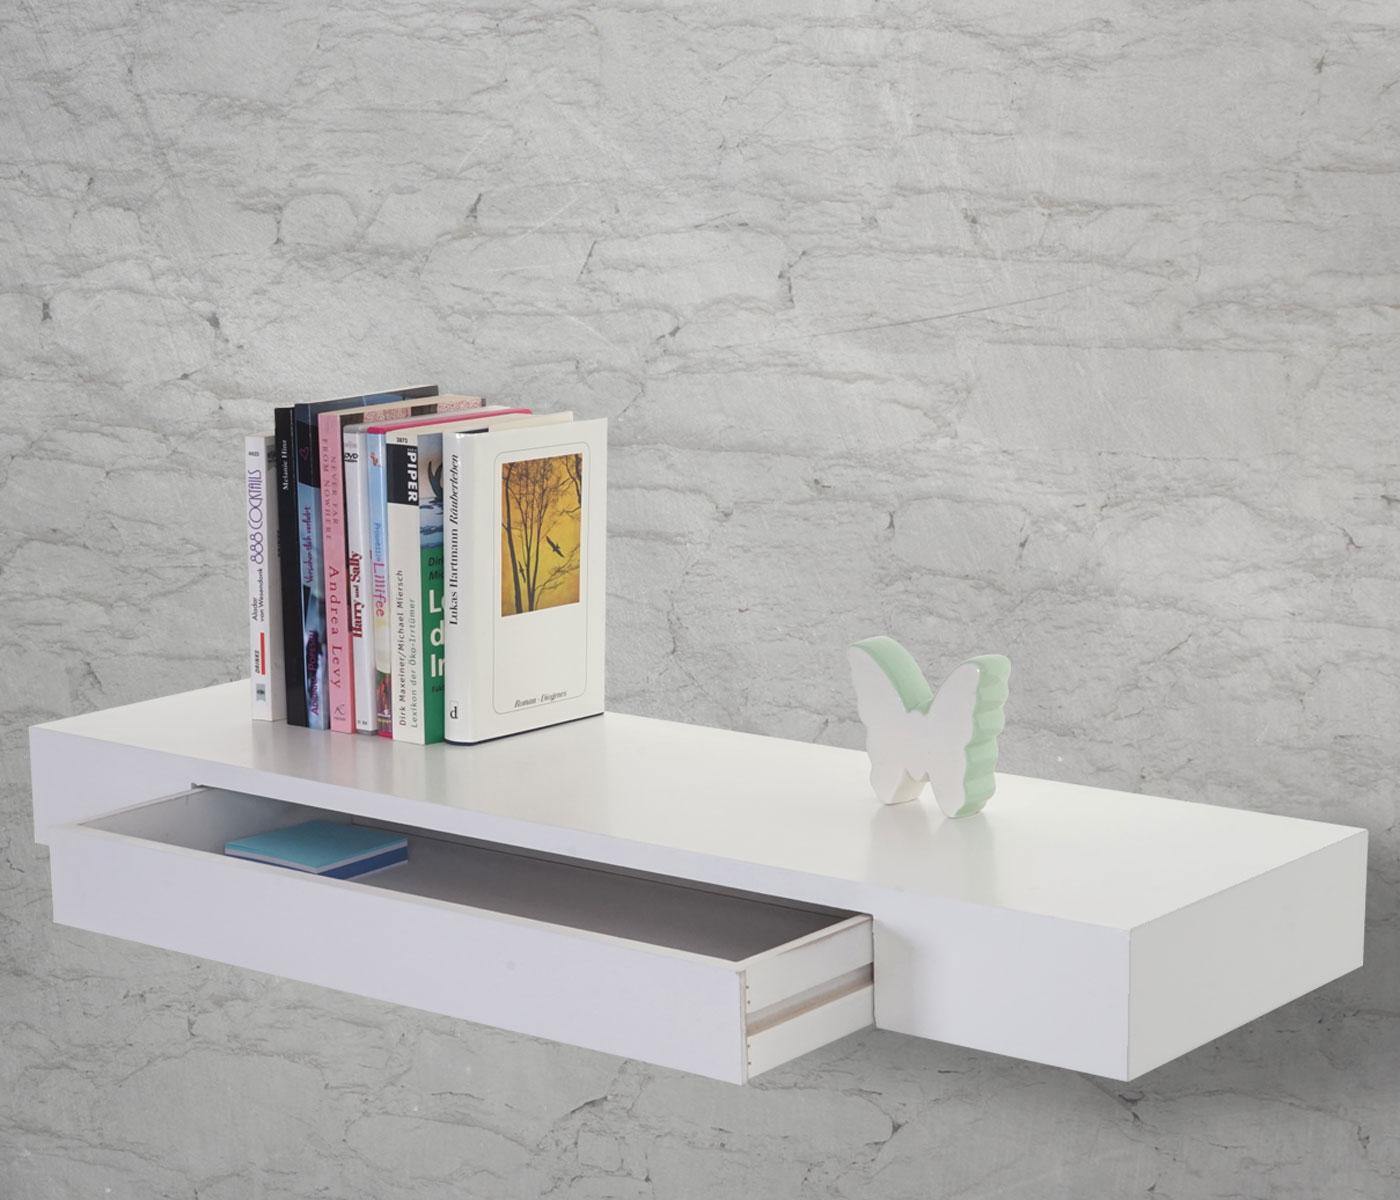 wandregal oise regal 80cm schublade weiss. Black Bedroom Furniture Sets. Home Design Ideas